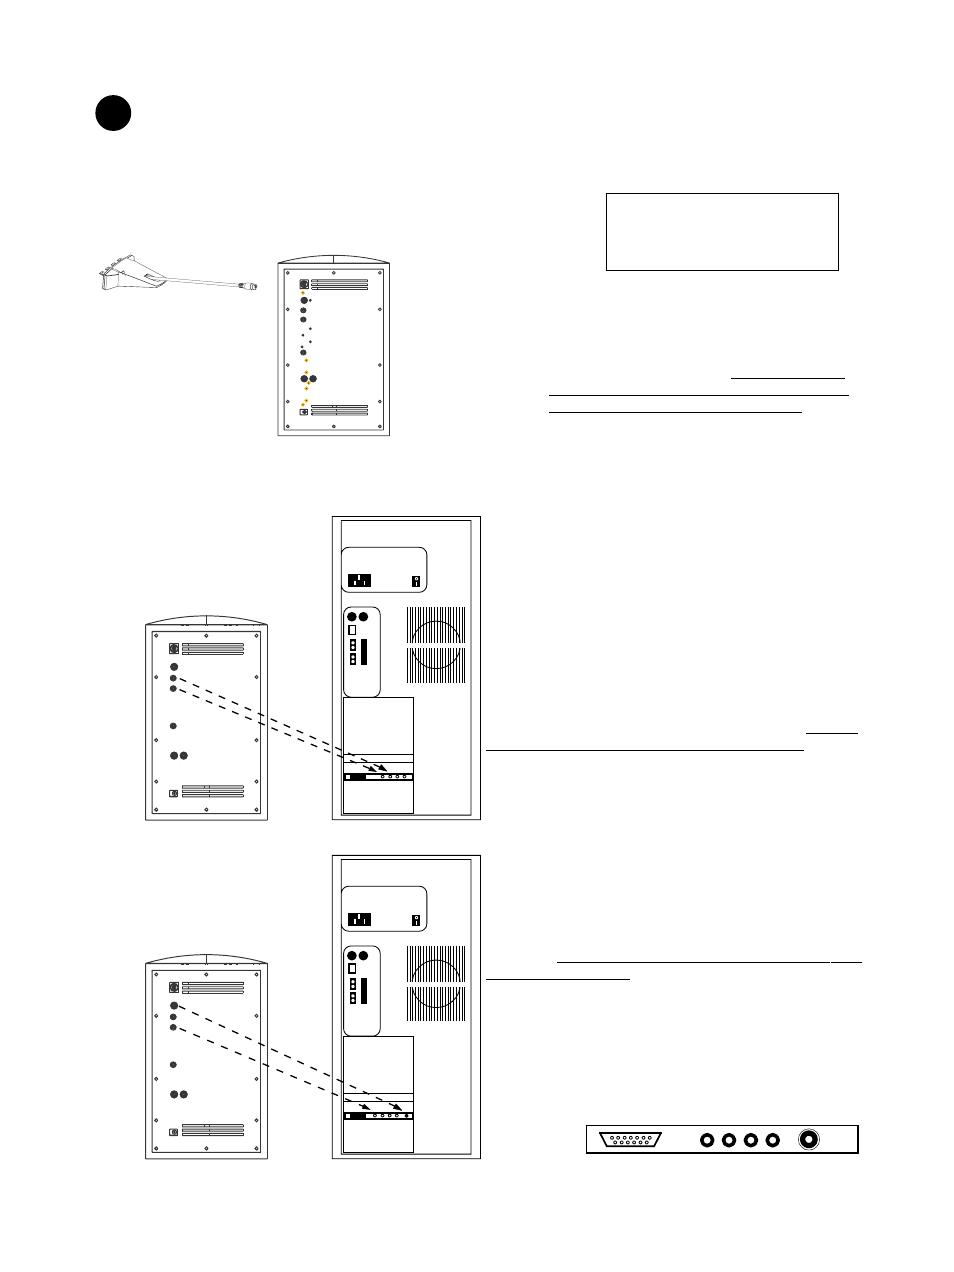 input panel connections boston acoustics ba7500 user manual page rh manualsdir com